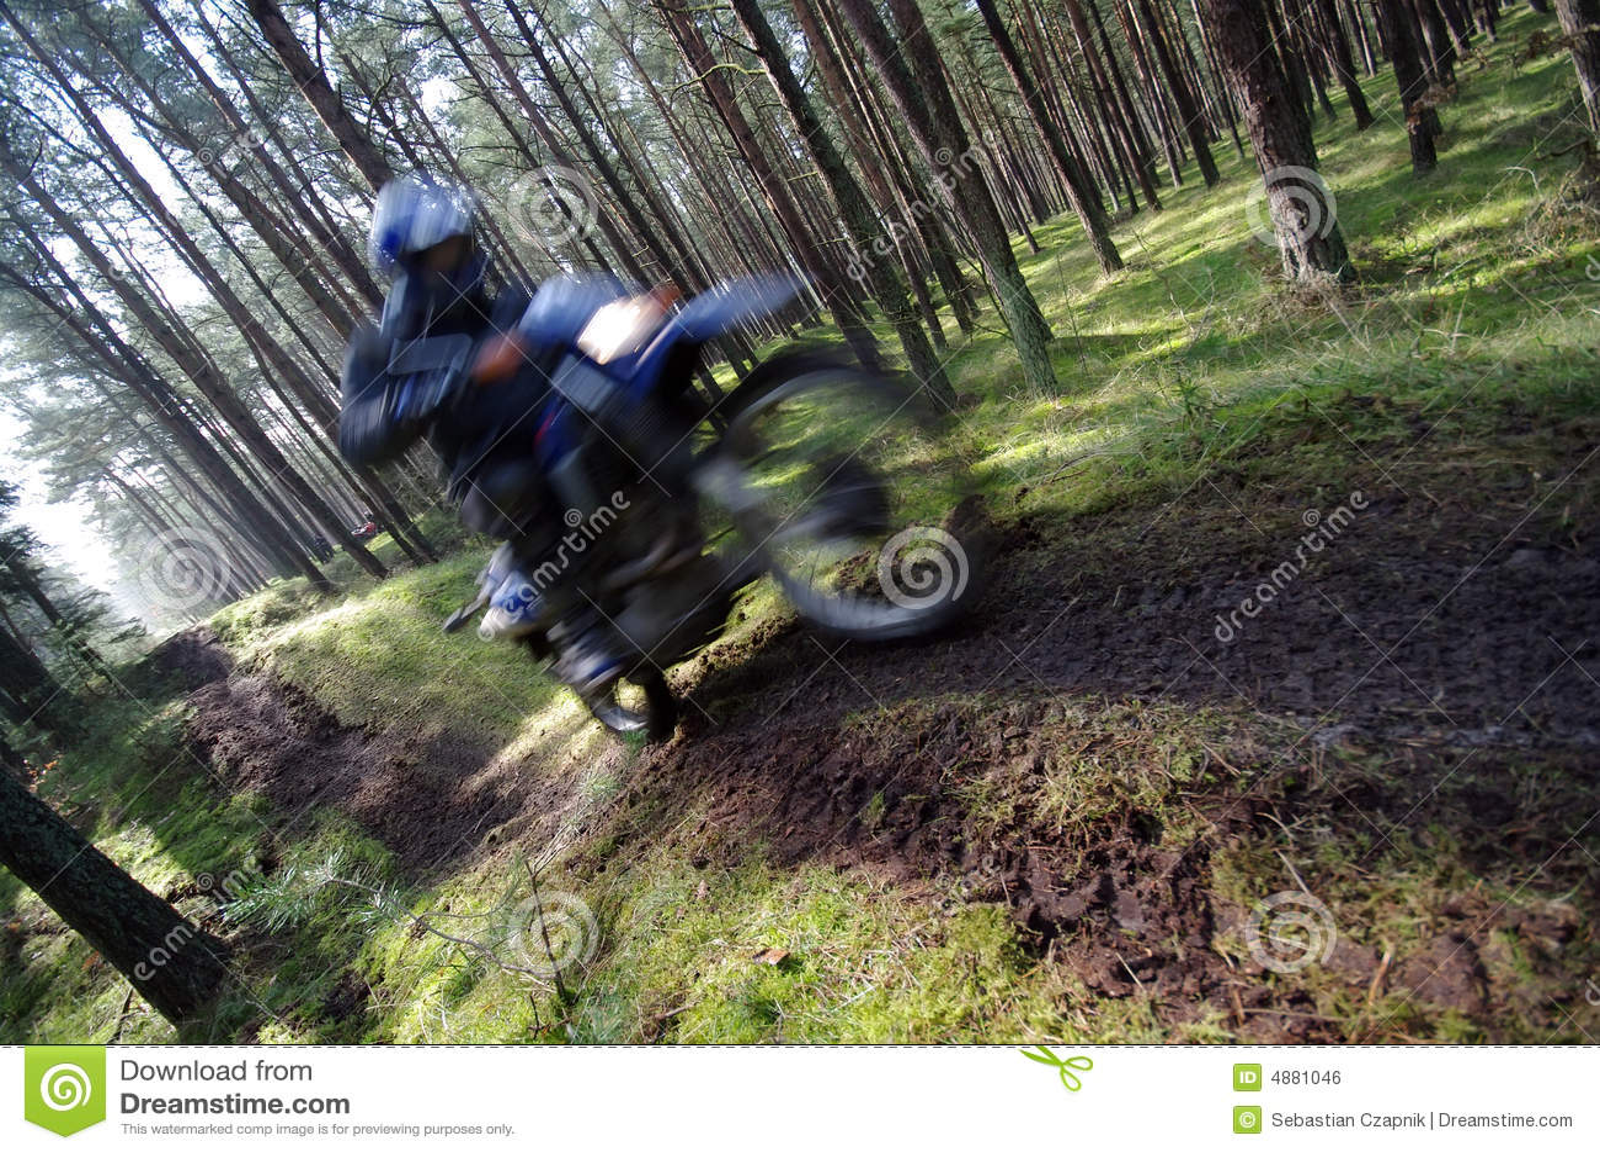 Motocross through forest